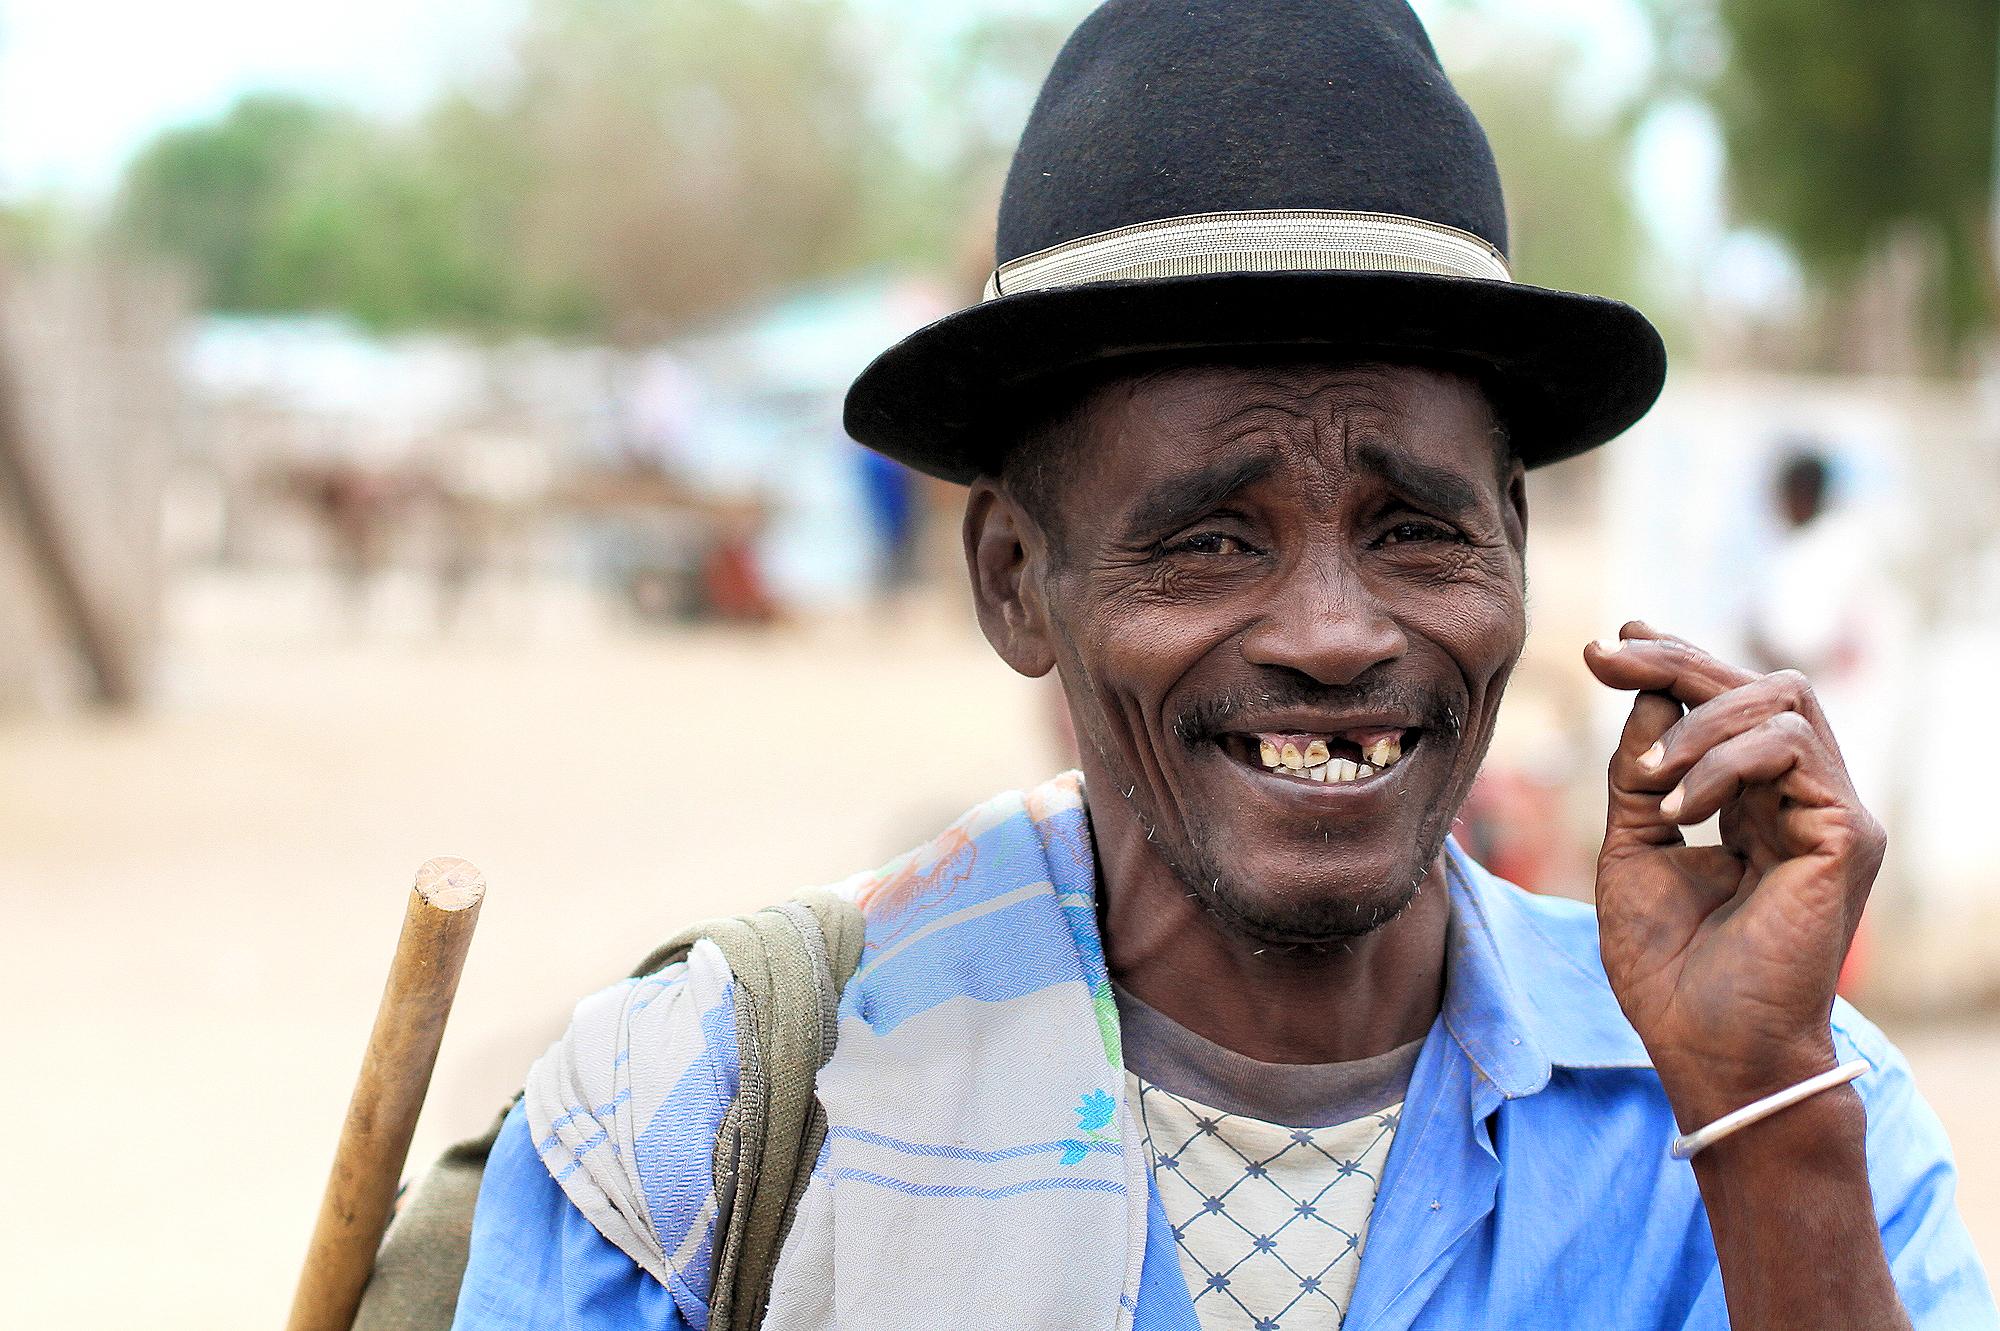 Wallpaper Madagascar Malgache Homme Sourire Dent Teeth